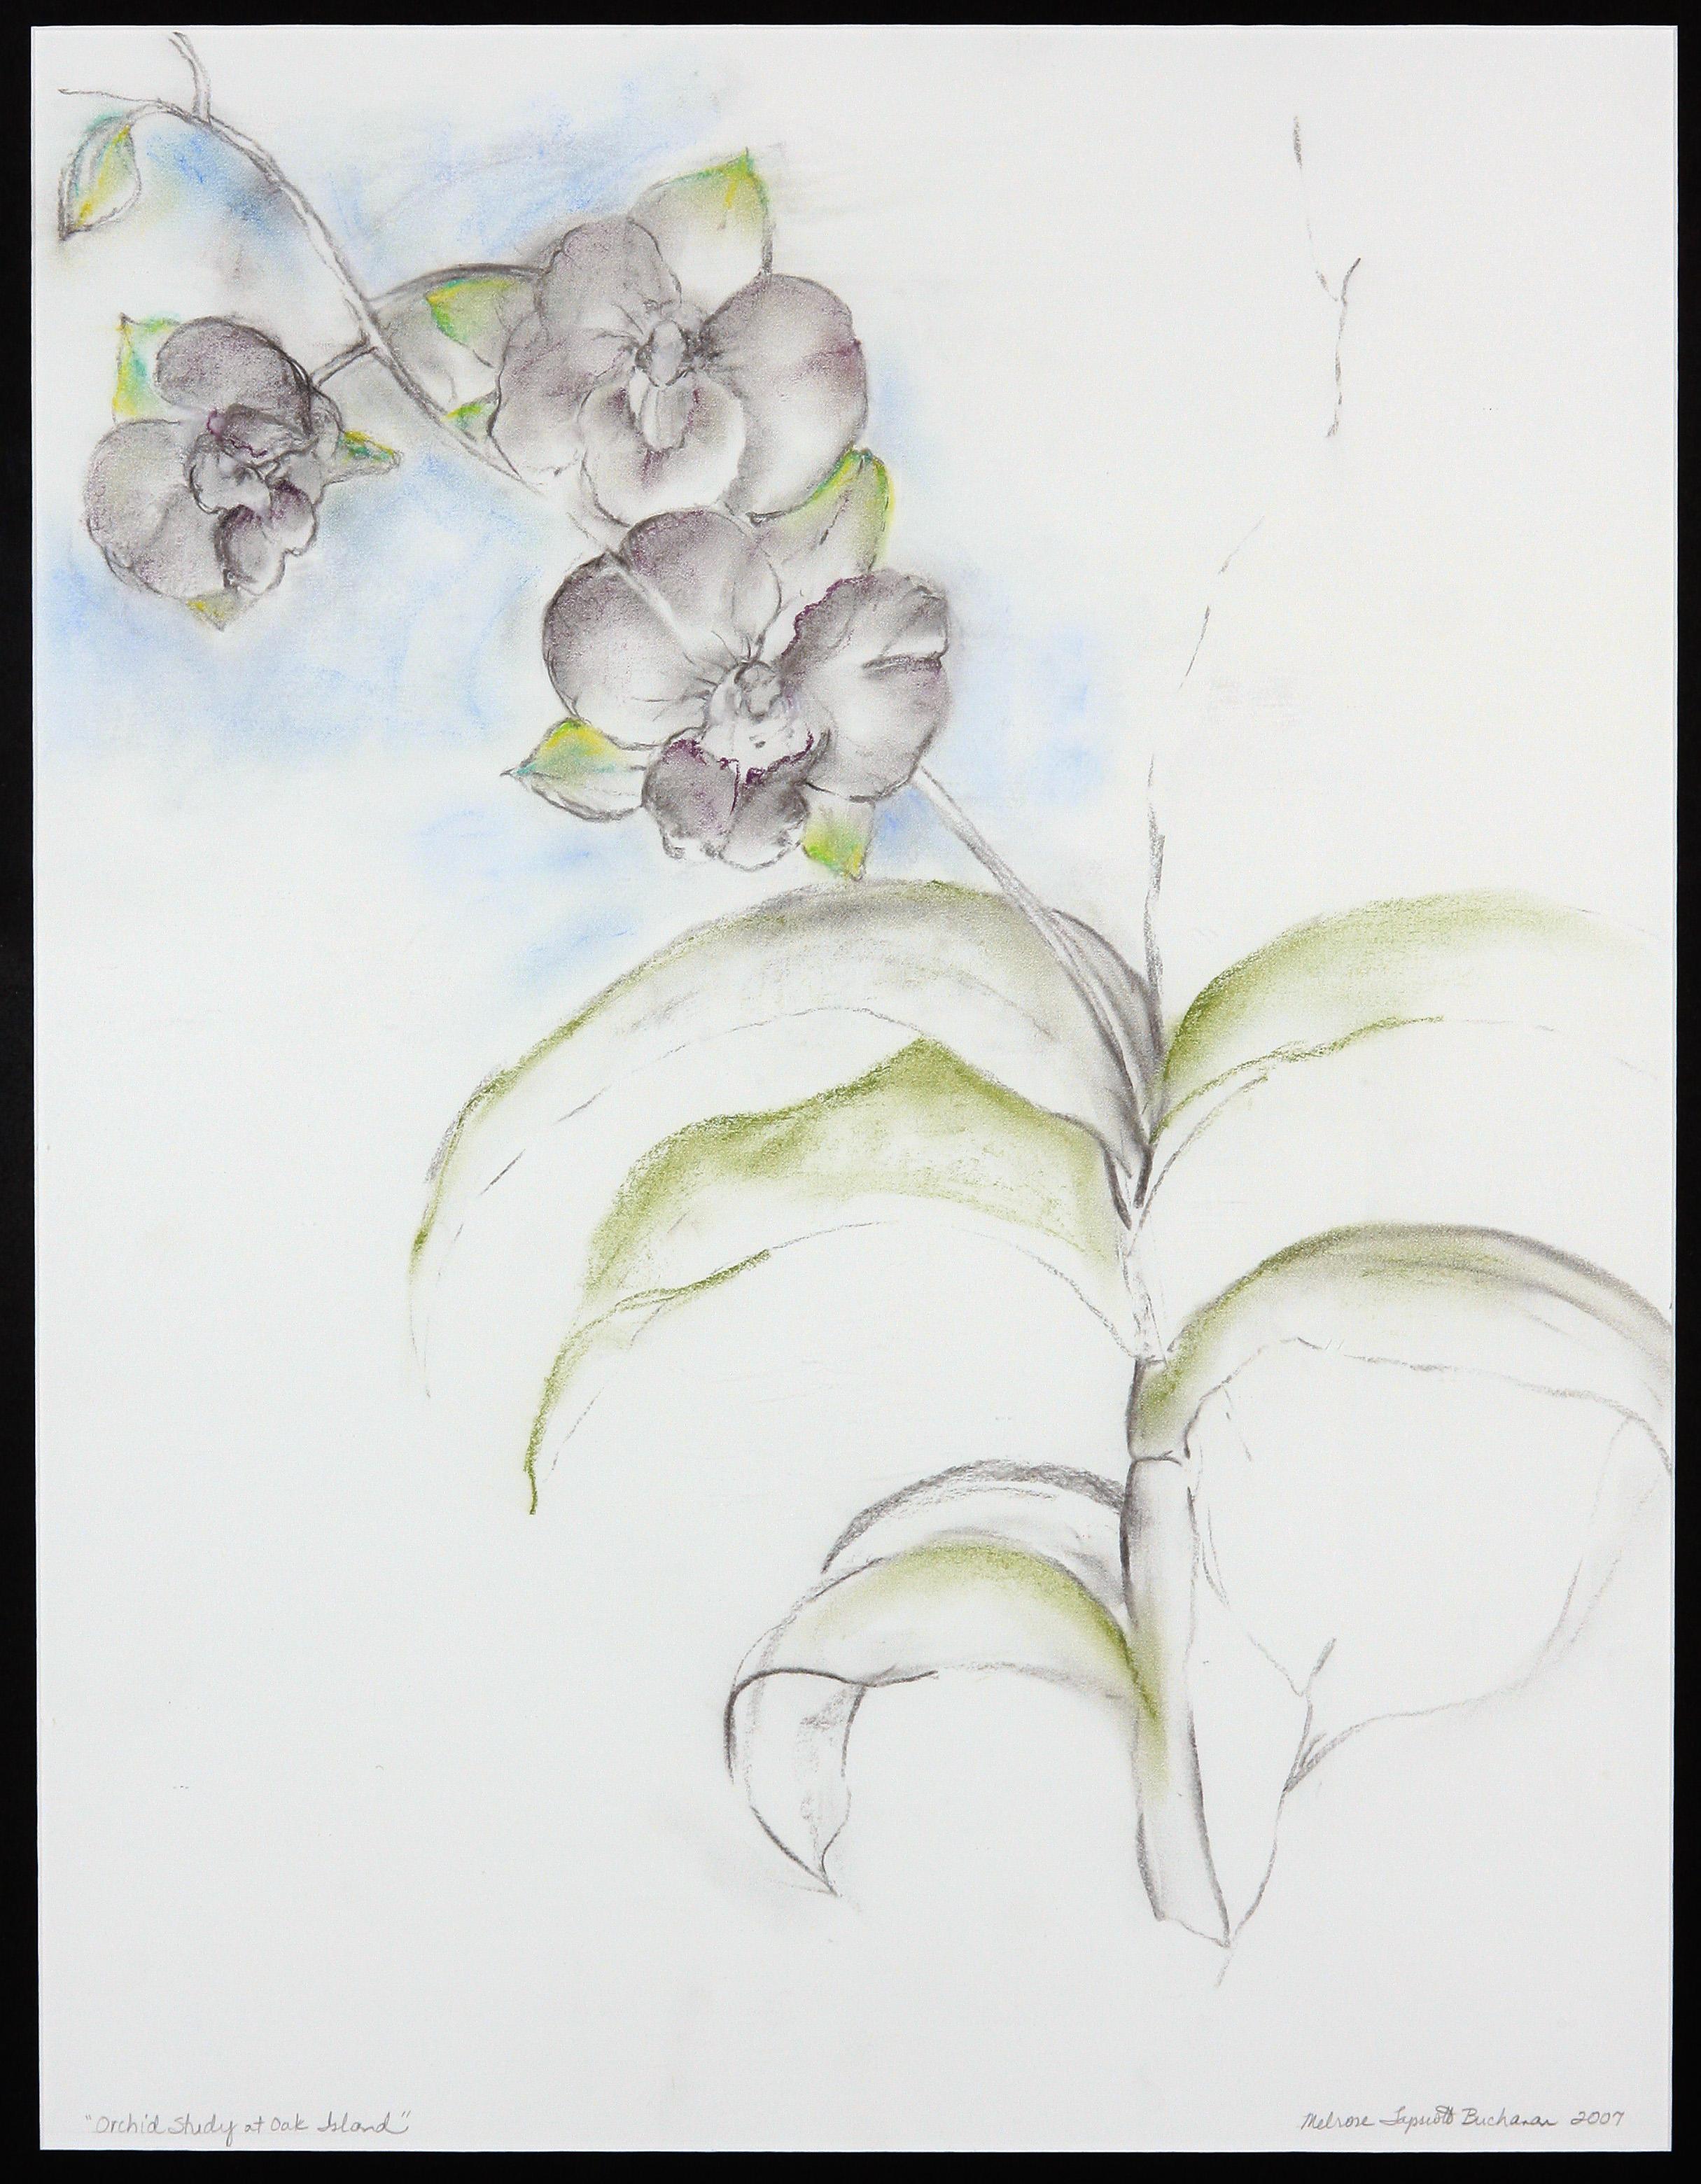 Orchard Study at Oak Island